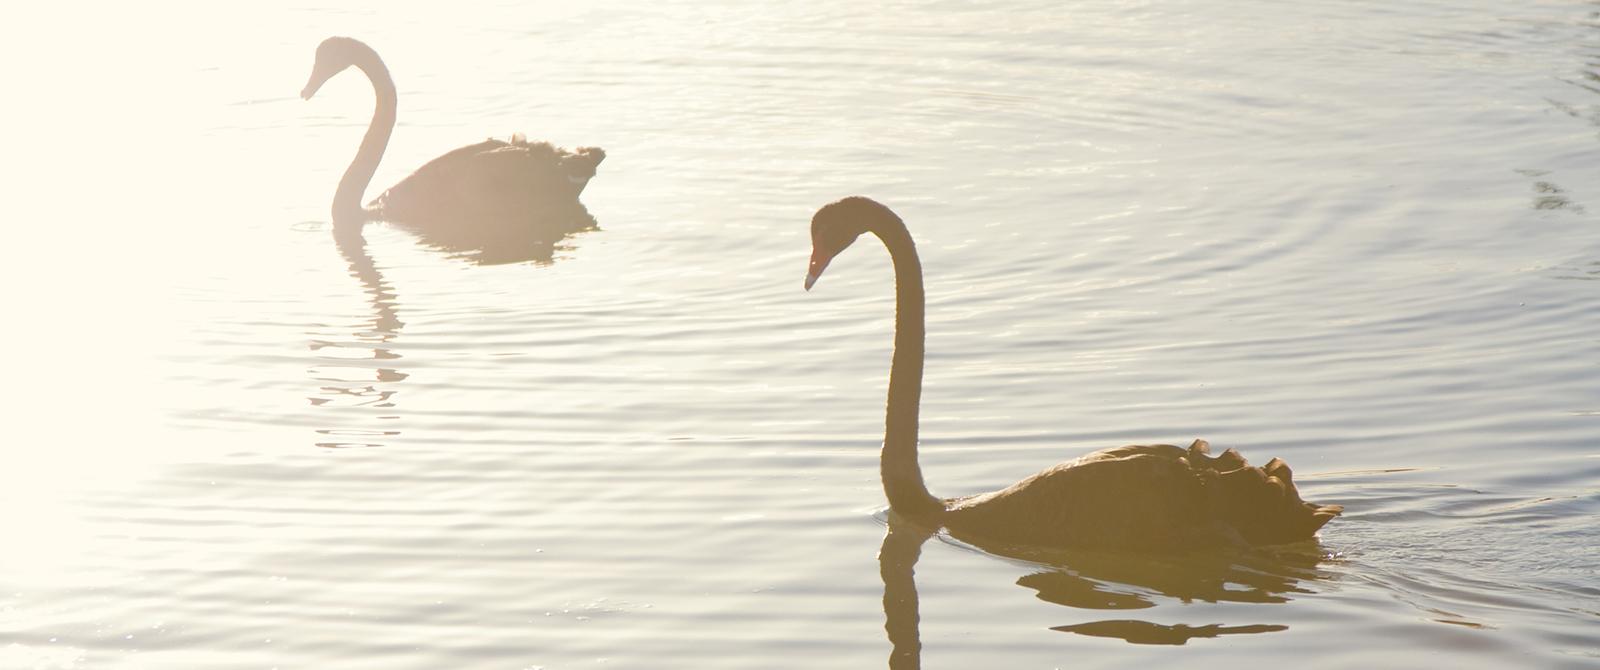 Two black swans on a lake